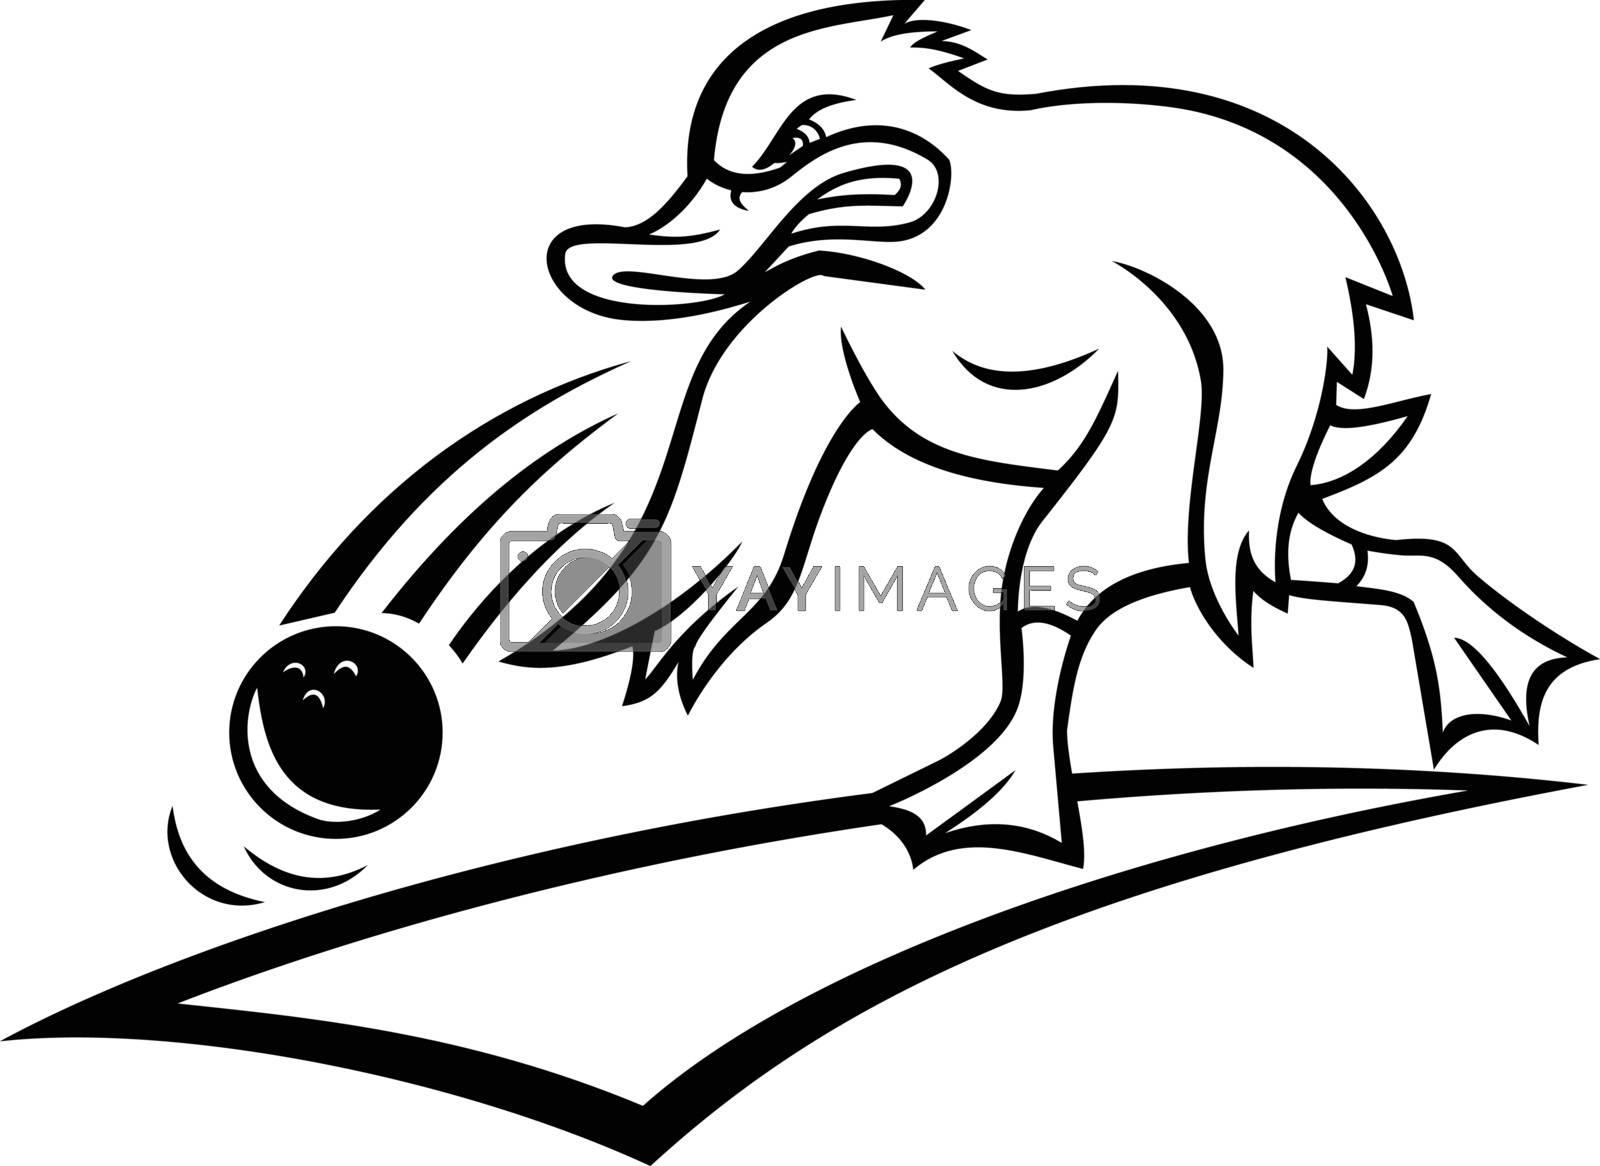 Duck Bowler Bowling Ball Cartoon Black and White by patrimonio